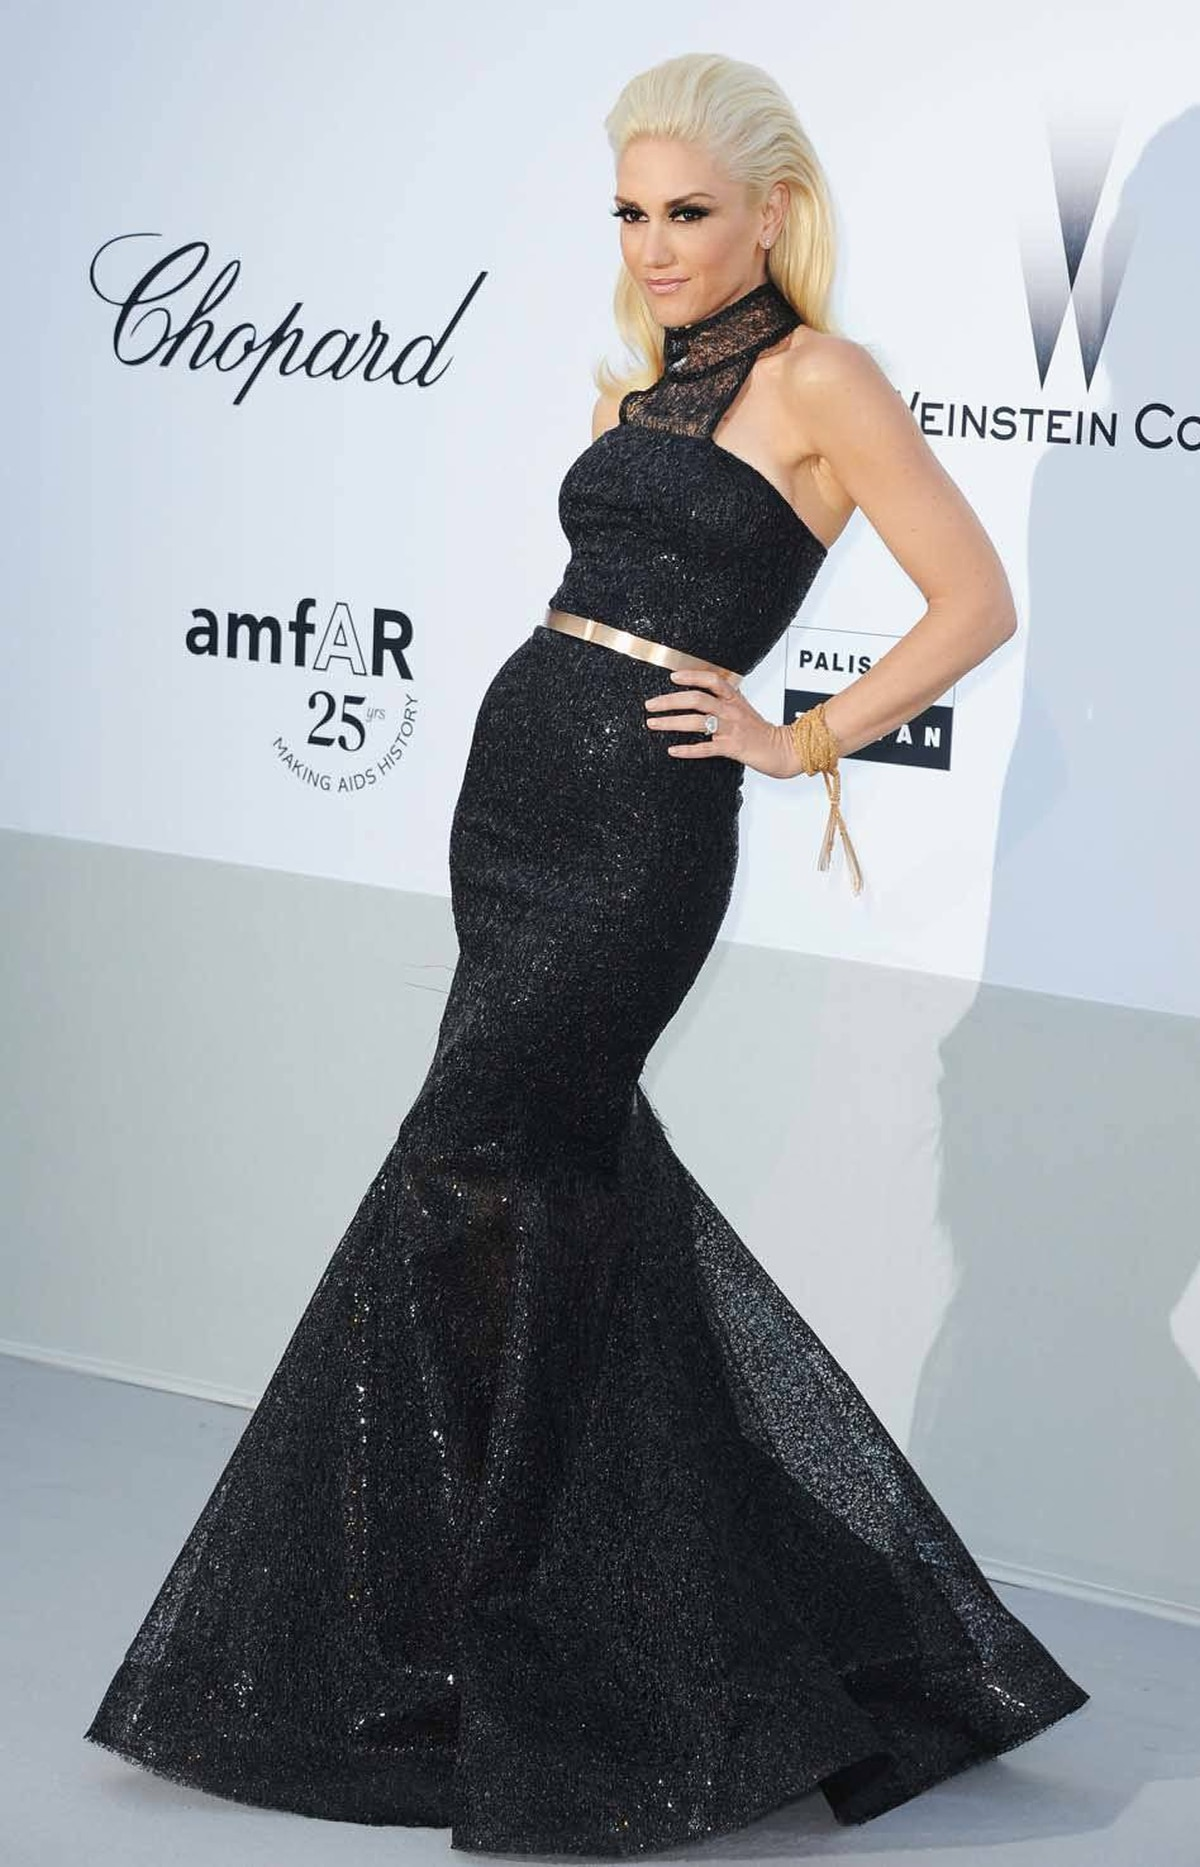 Gwen Stefani attends amfAR's Cinema Against AIDS Gala at the Cannes Film Festival on Thursday.